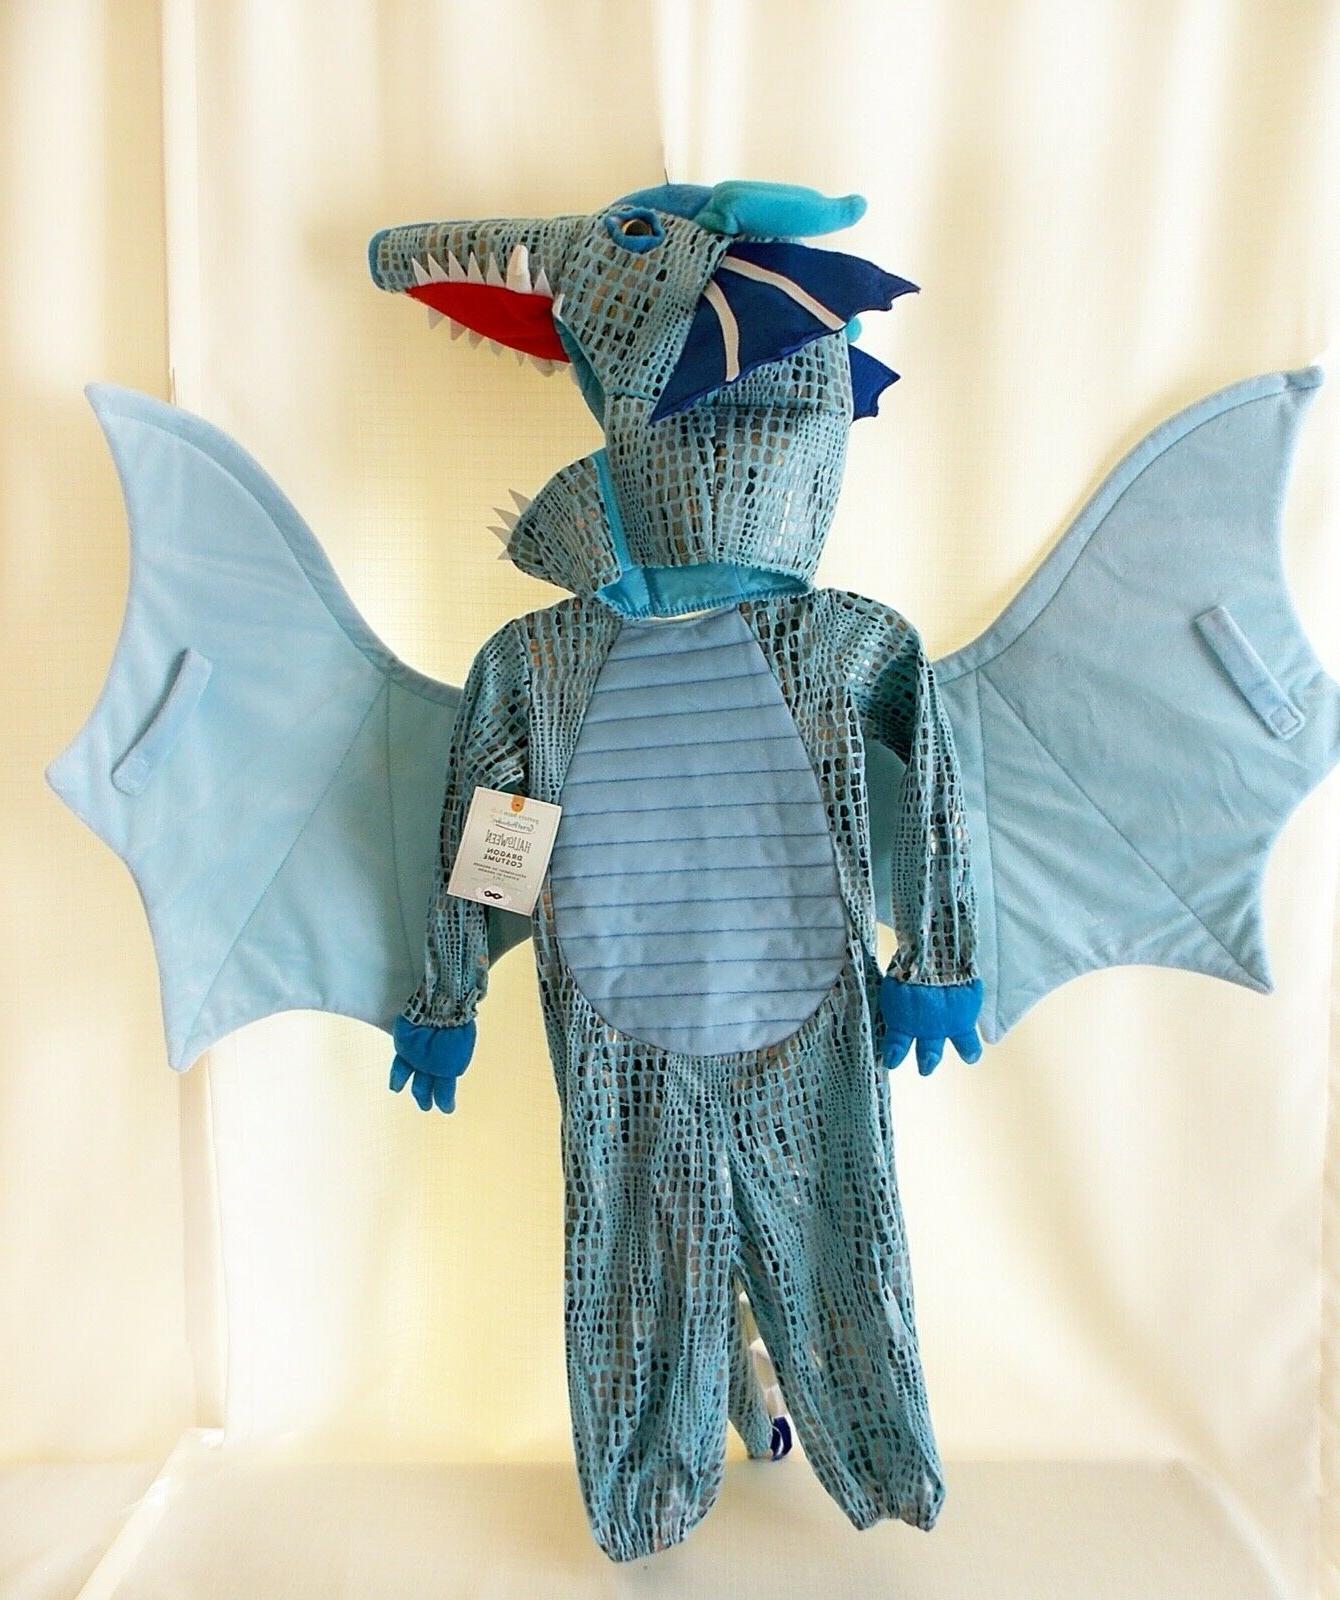 new blue dragon costume 3t wings halloween